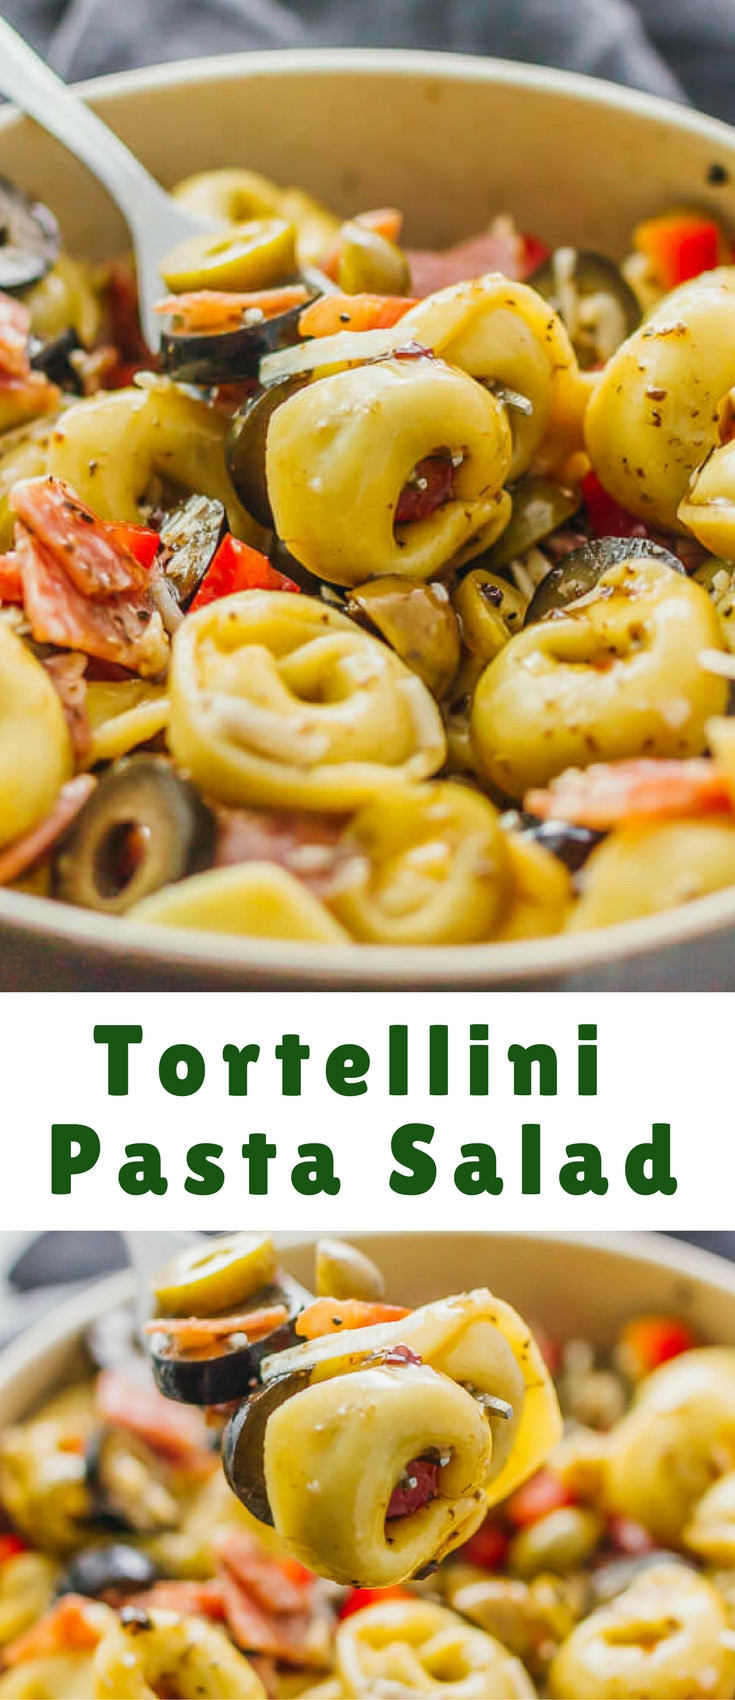 Tortellini Pasta Salad With Italian Dressing  Tortellini Pasta Salad with Italian Dressing Blogger Bests